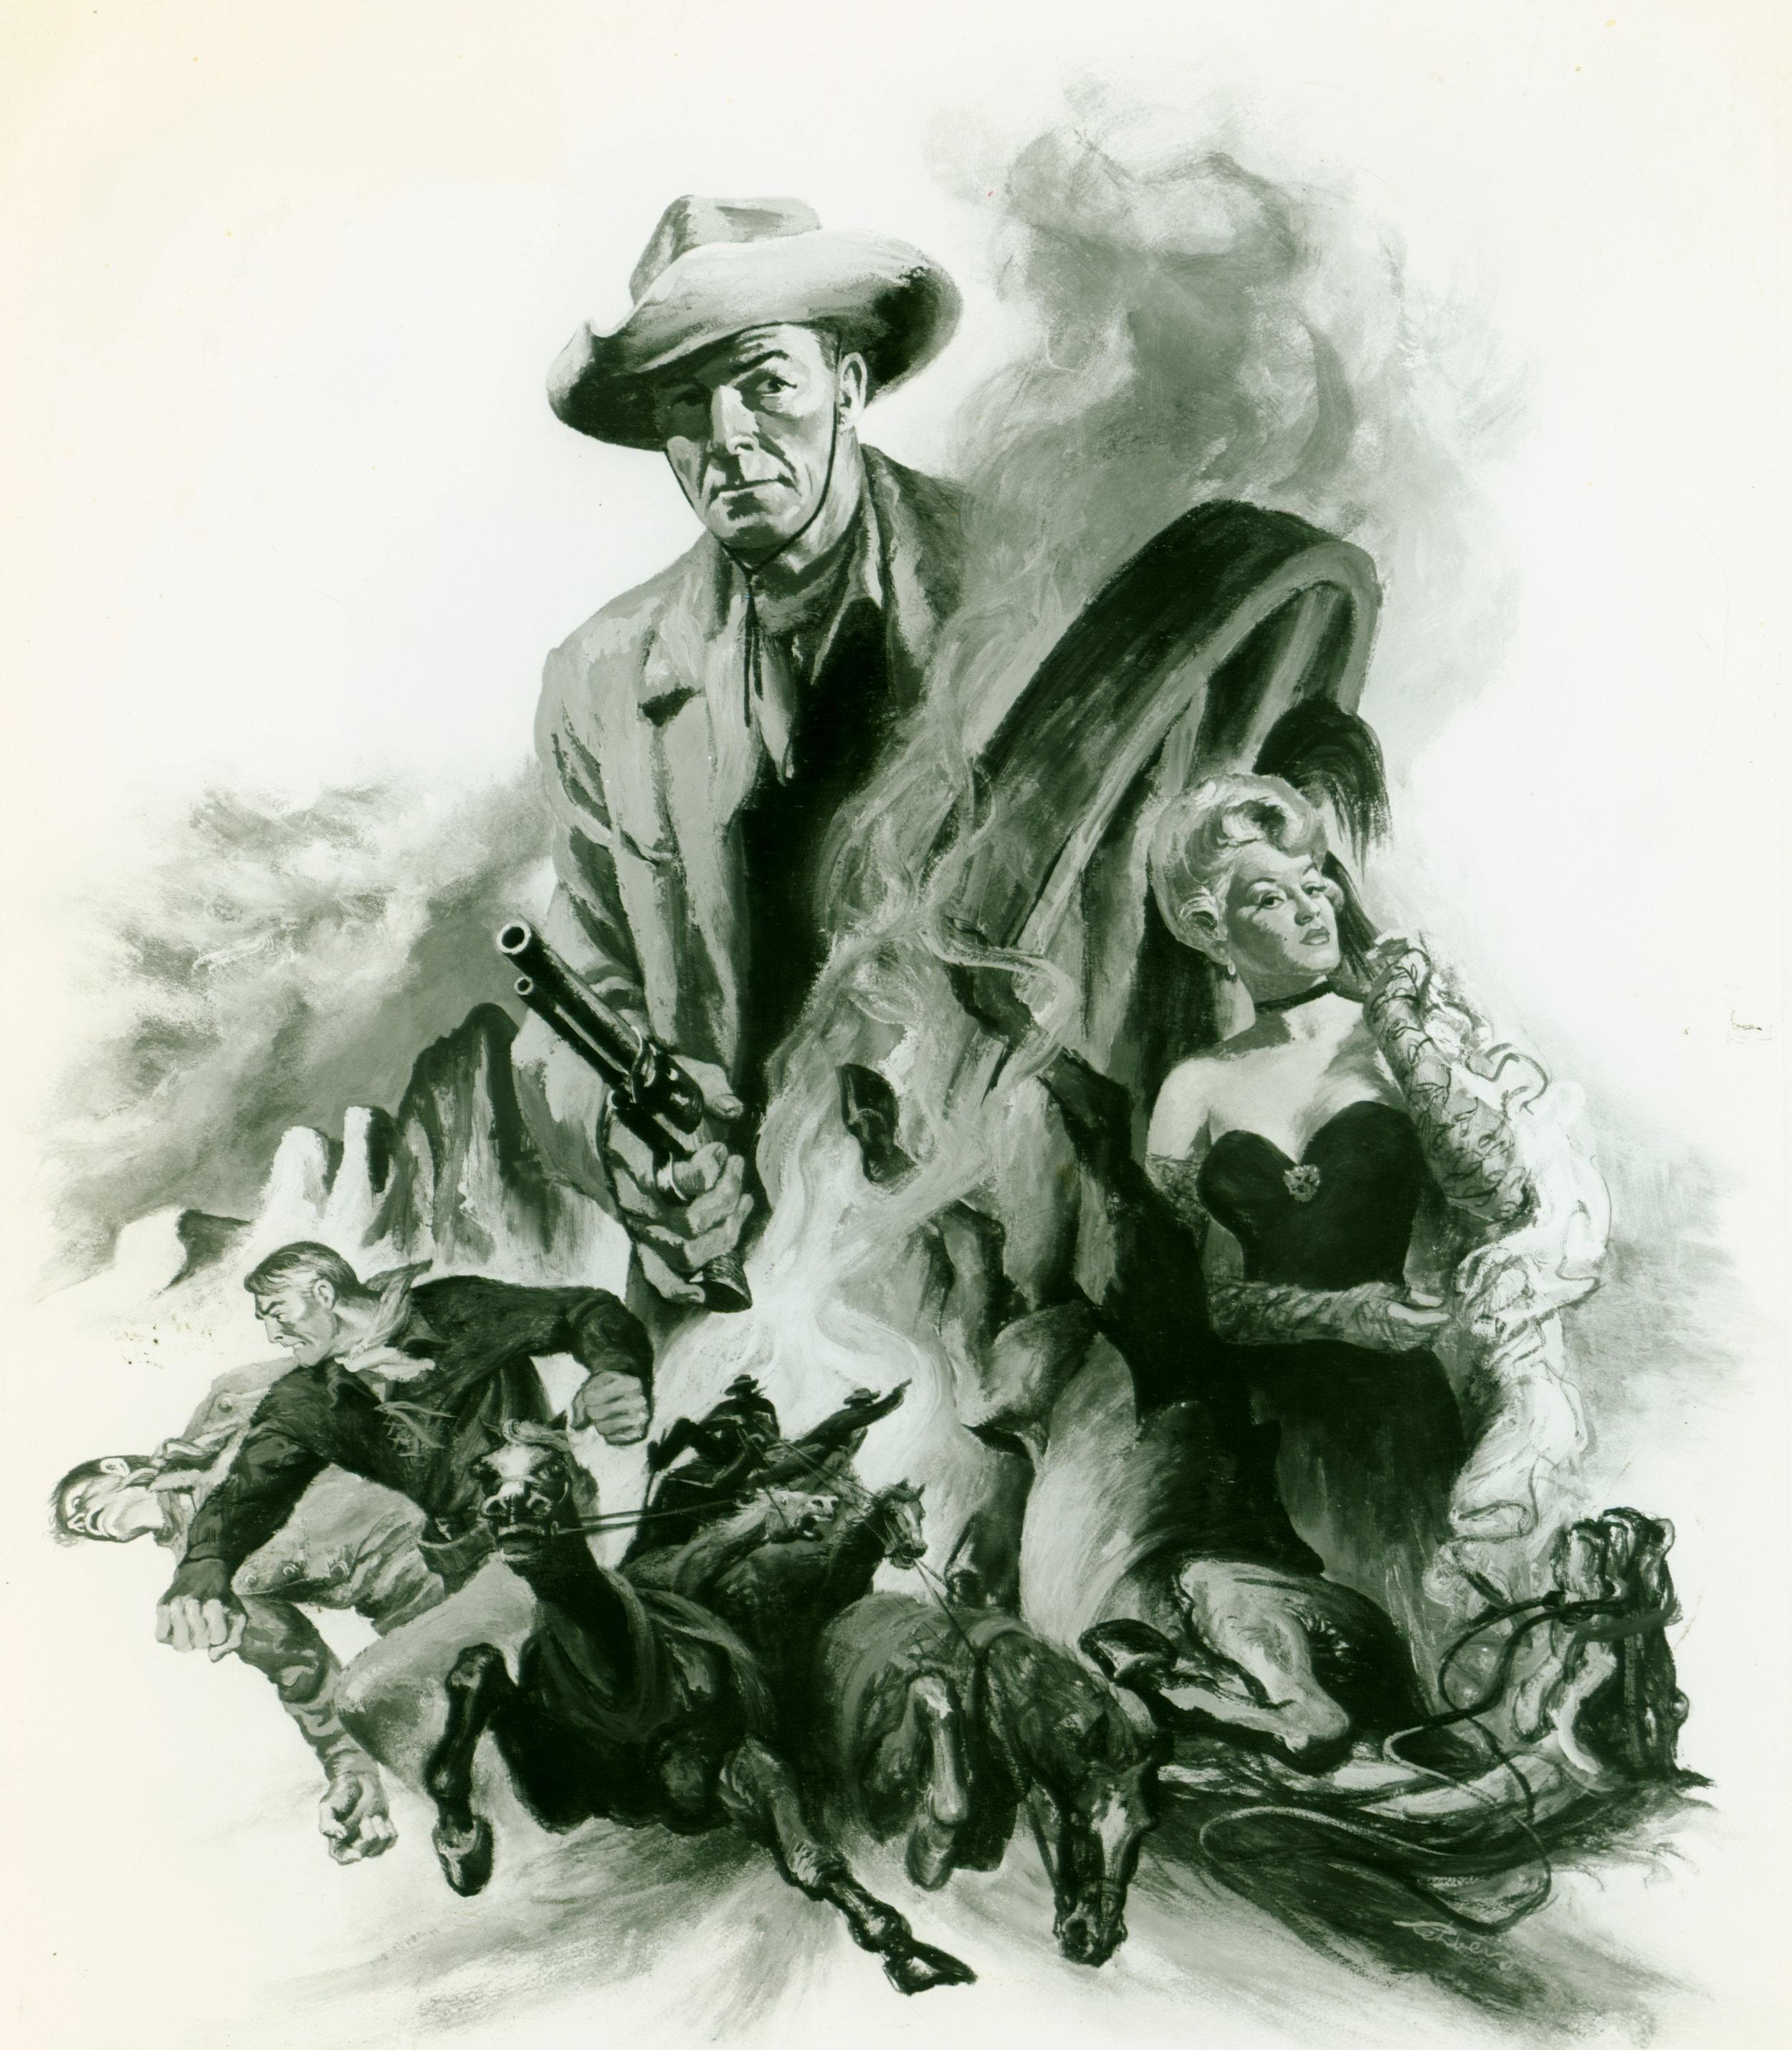 """The Stranger Wore a Gun"" starring Randolph Scott (Columbia Pictures)"